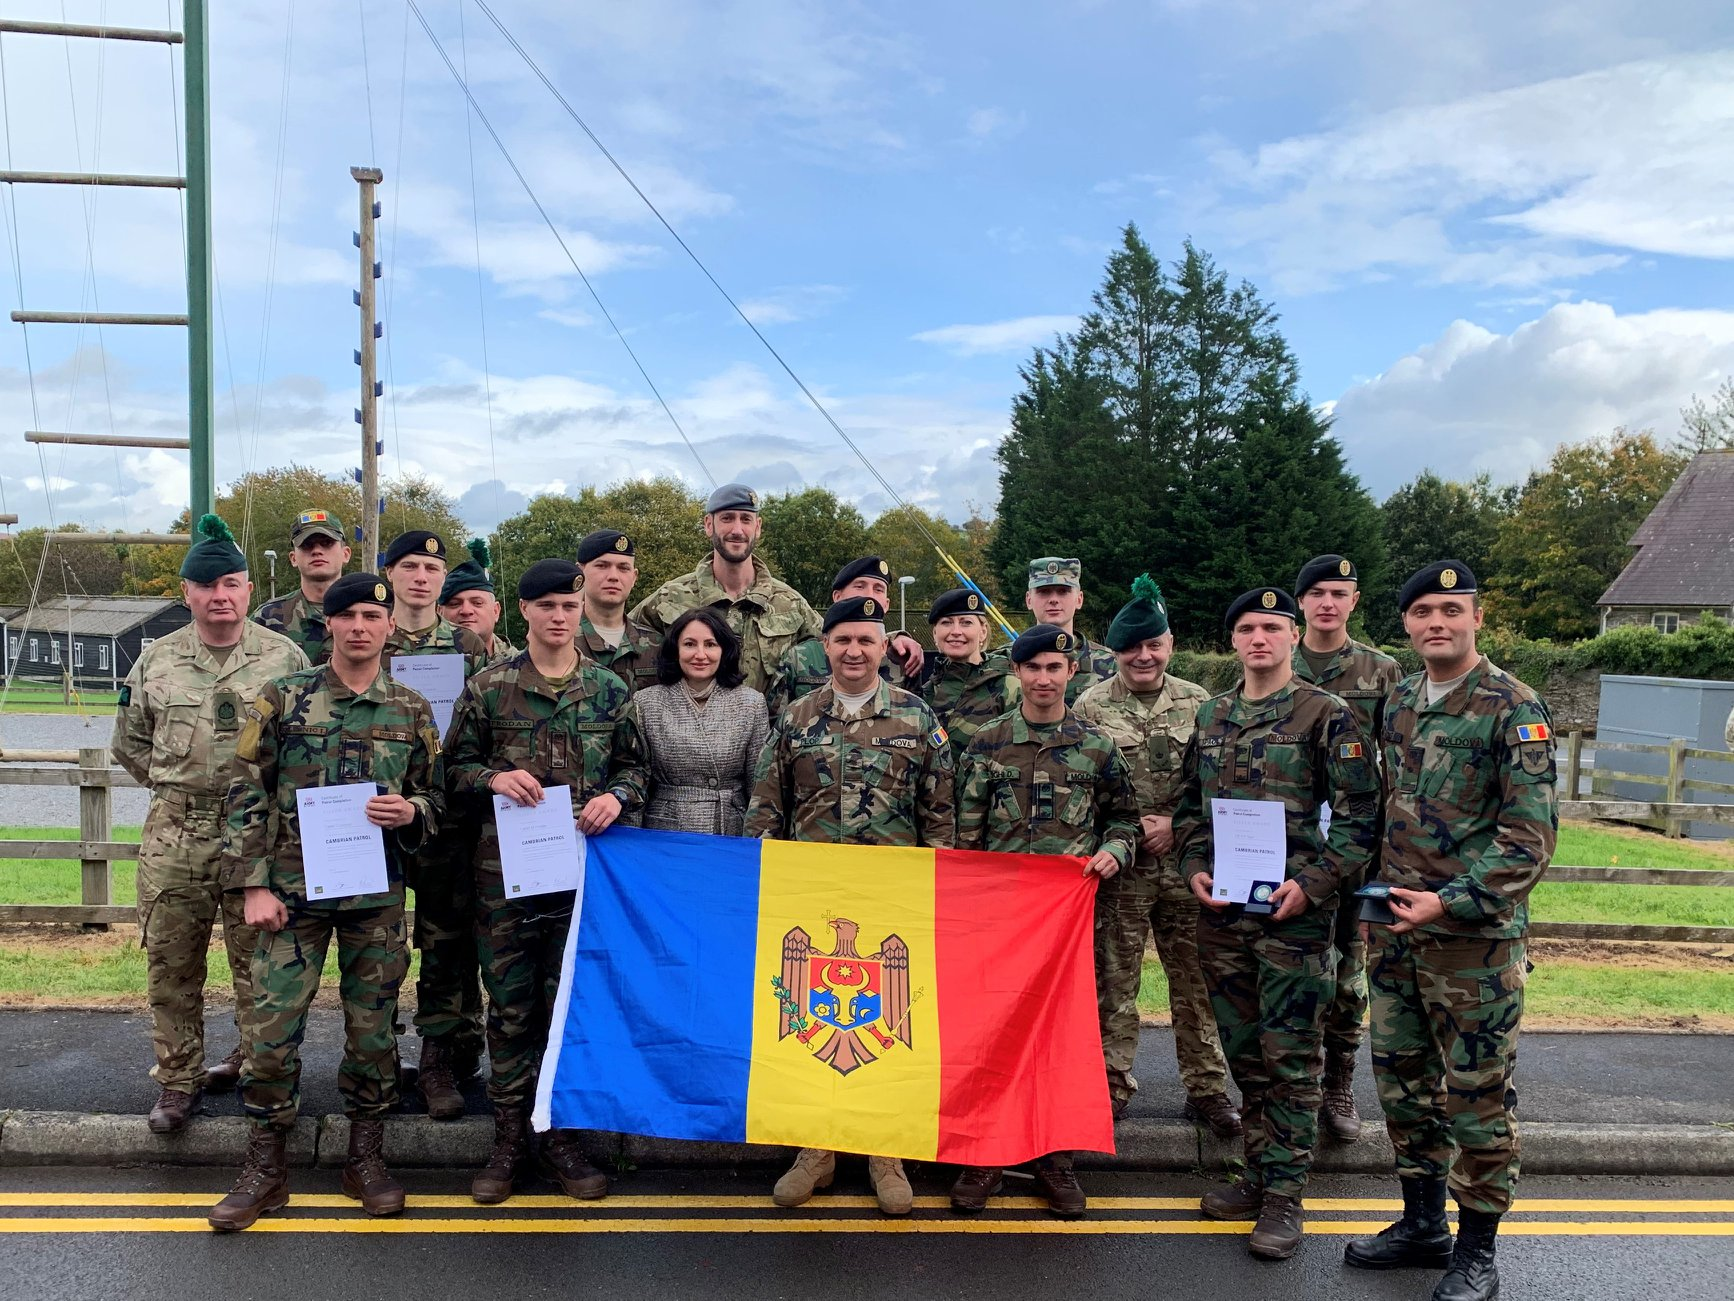 Medalie de argint, militari moldoveni, academia militară Alexandru cel Bun, Republica Moldova, concurs, Irlanda de nord, Cambrian Patrol 2019,